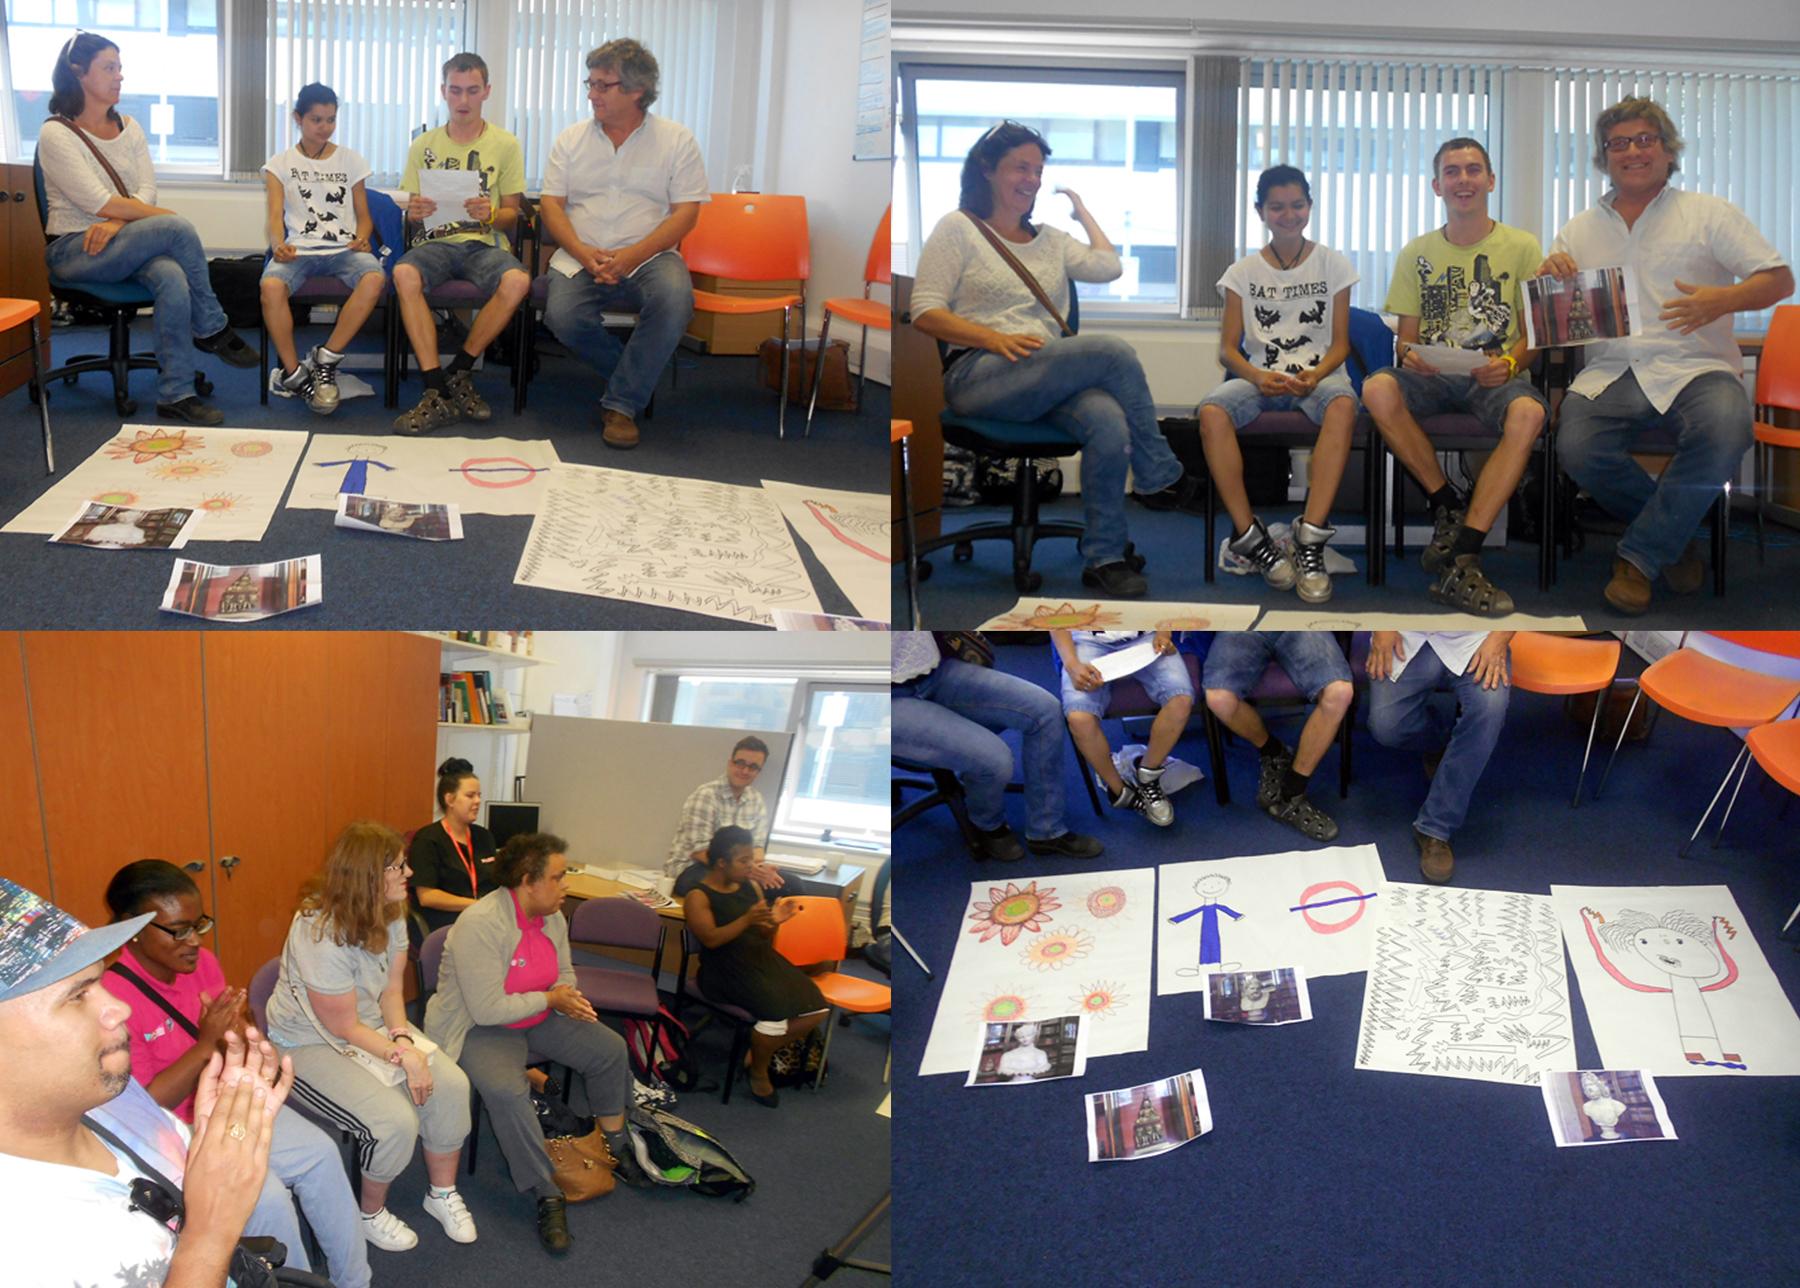 Austrian visitors Present Ideas